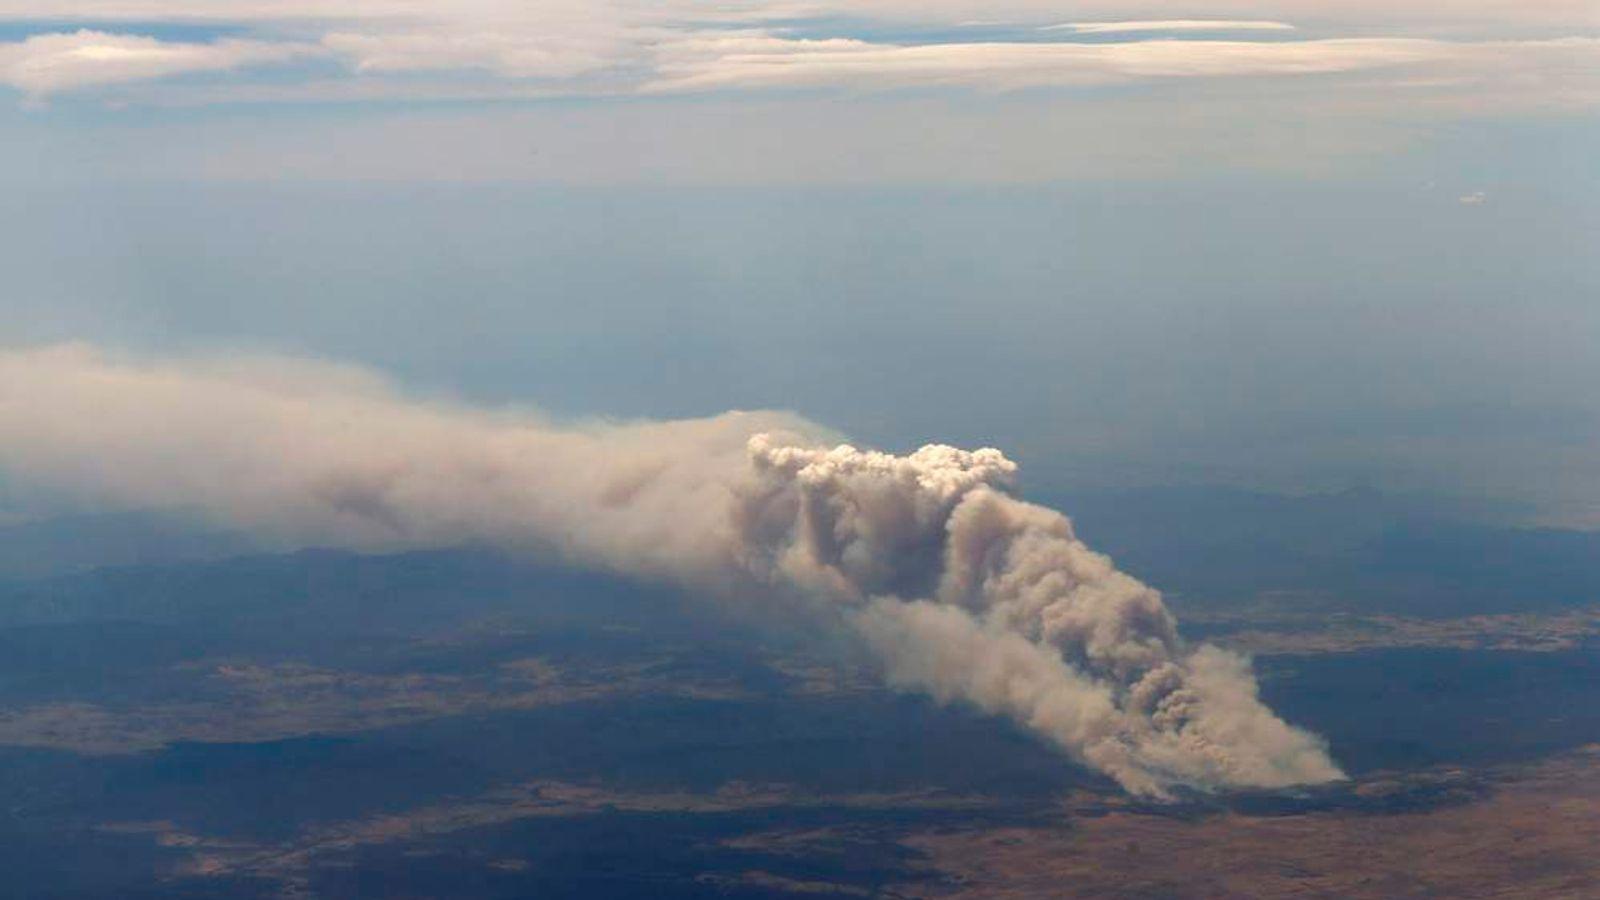 Smoke rises from the Yarrabin bushfire